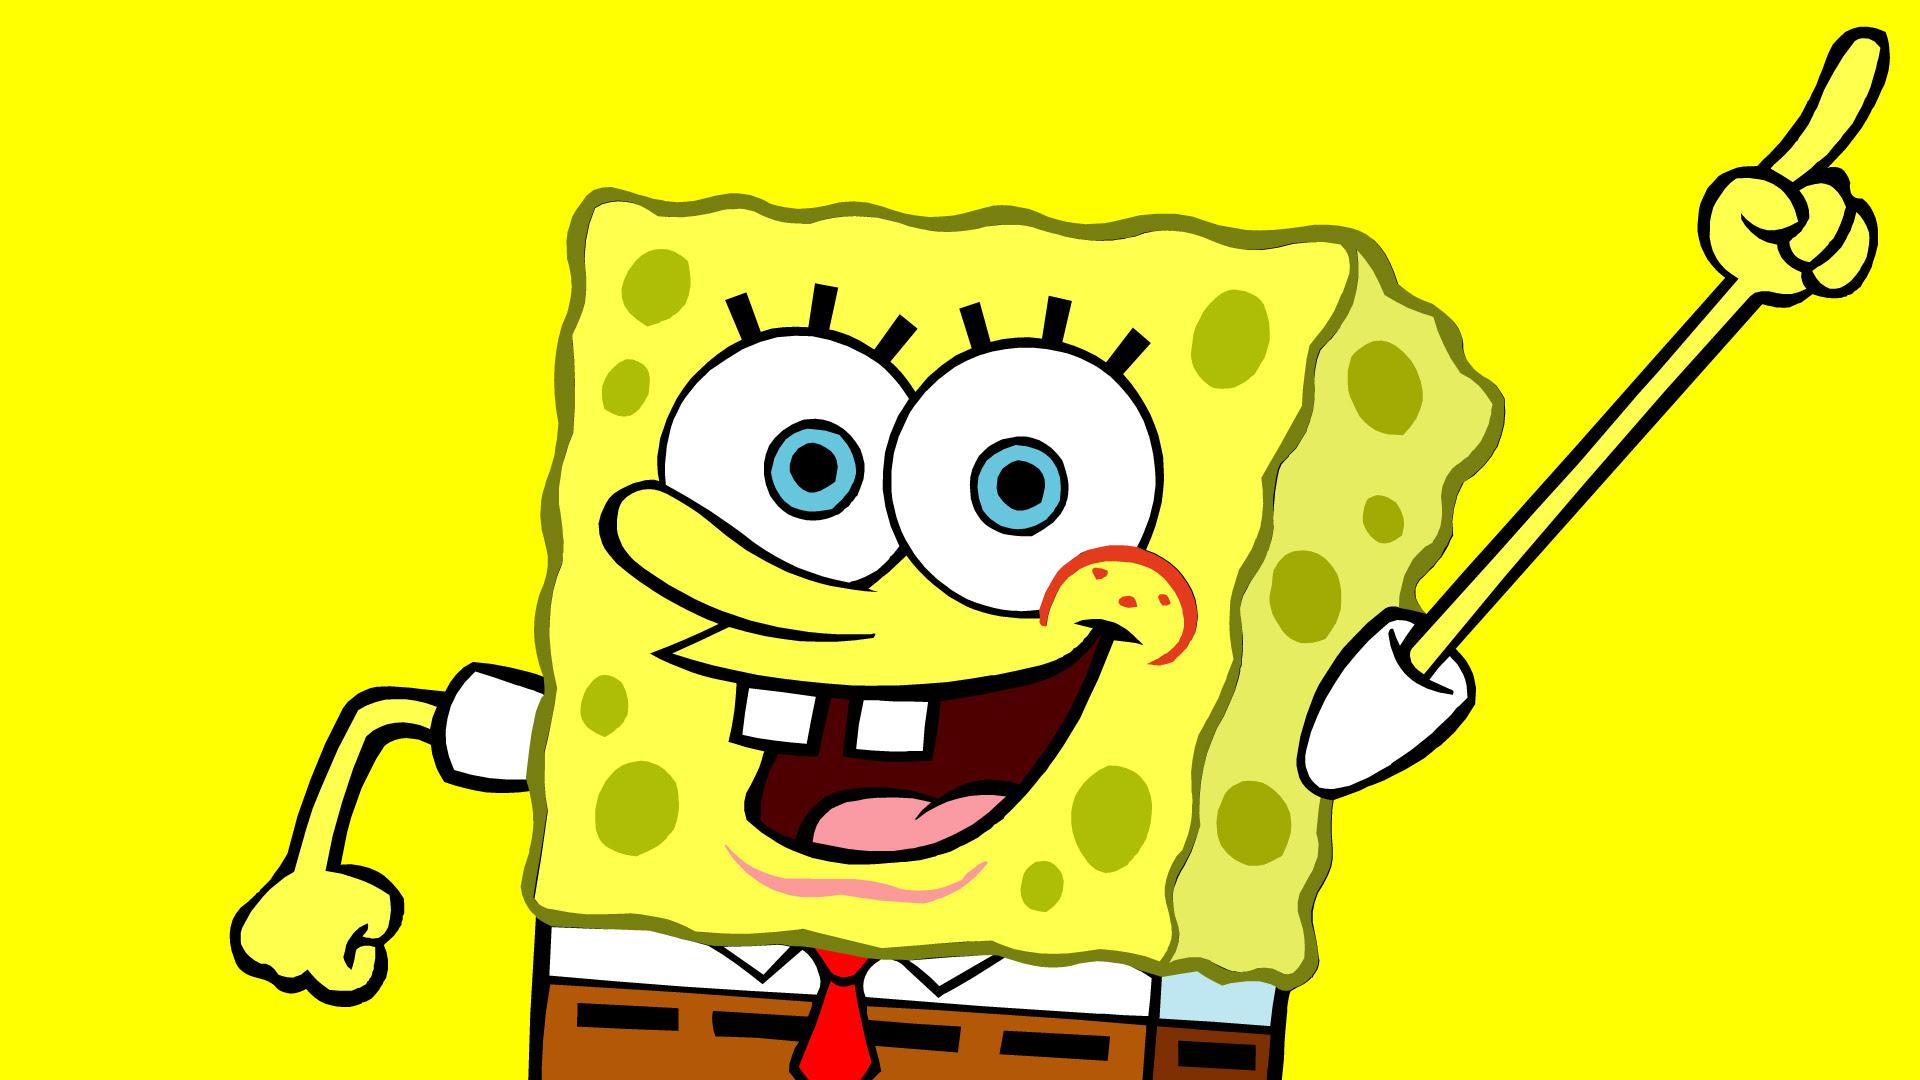 4k Spongebob Wallpapers High Quality Download Free